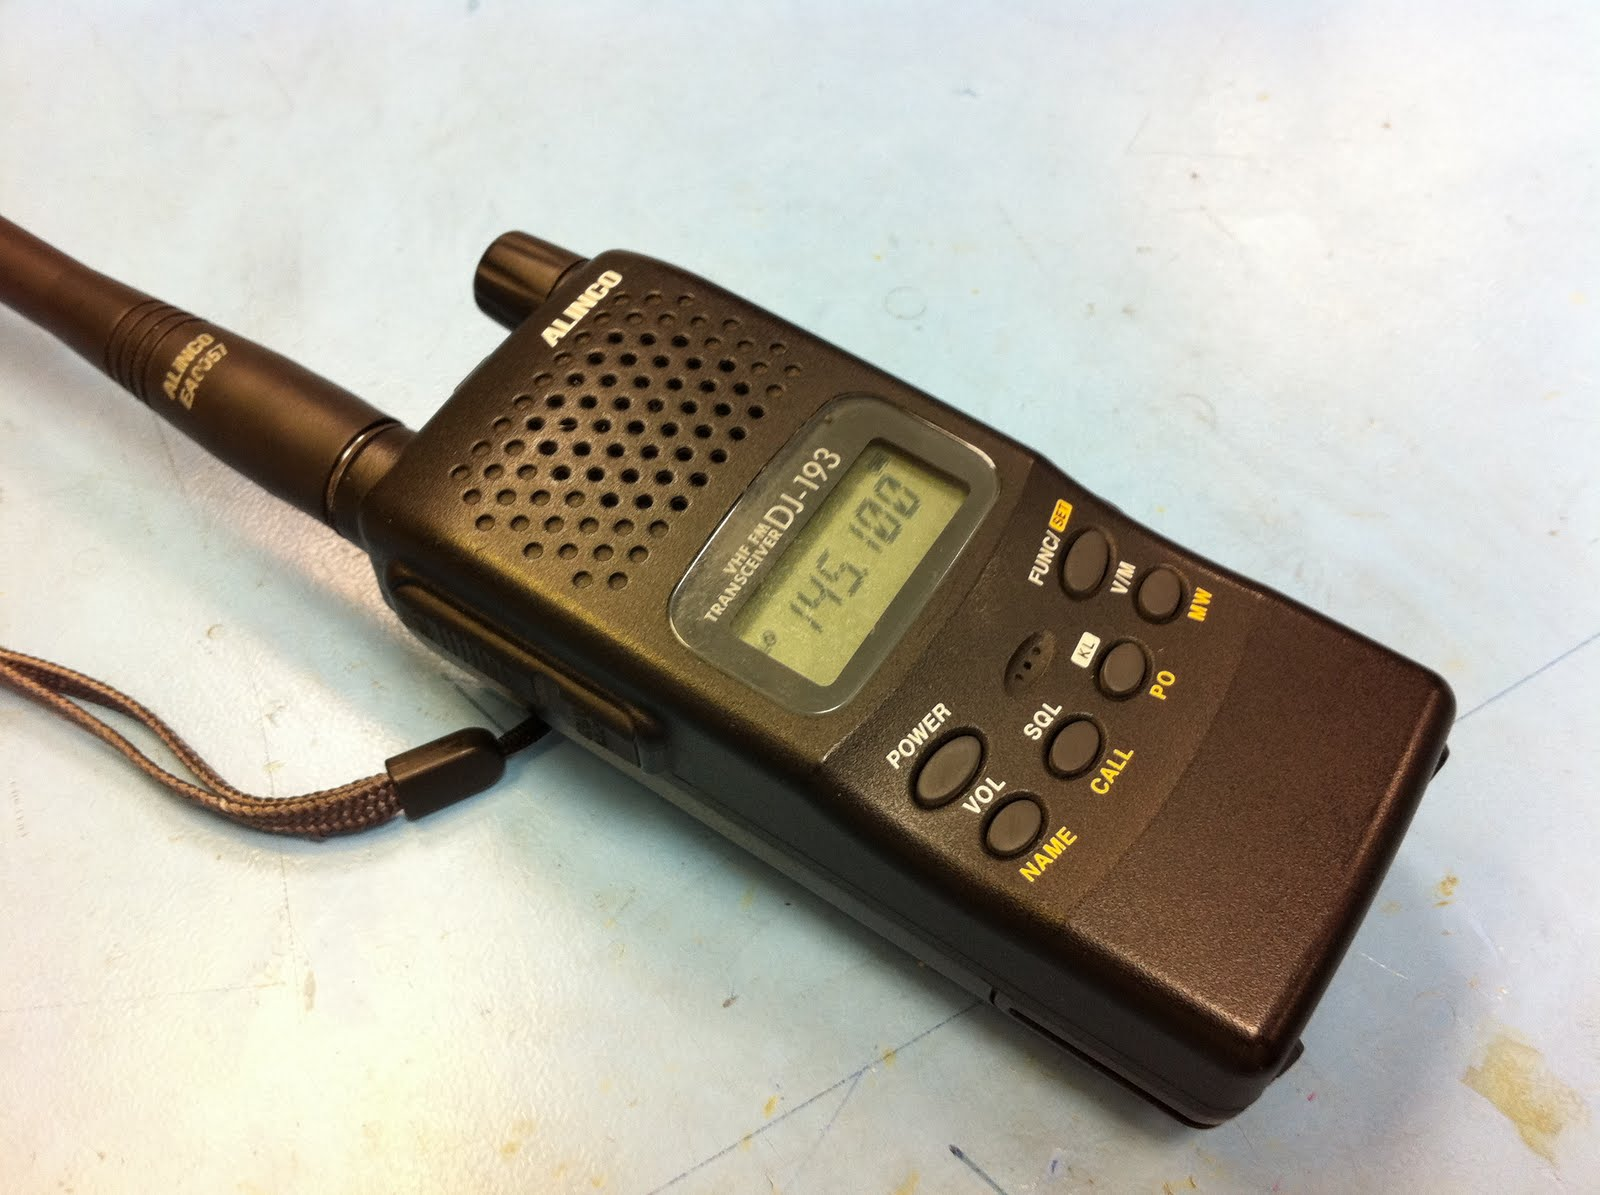 The Repair Blog: Alinco DJ-193 no sound from internal speaker